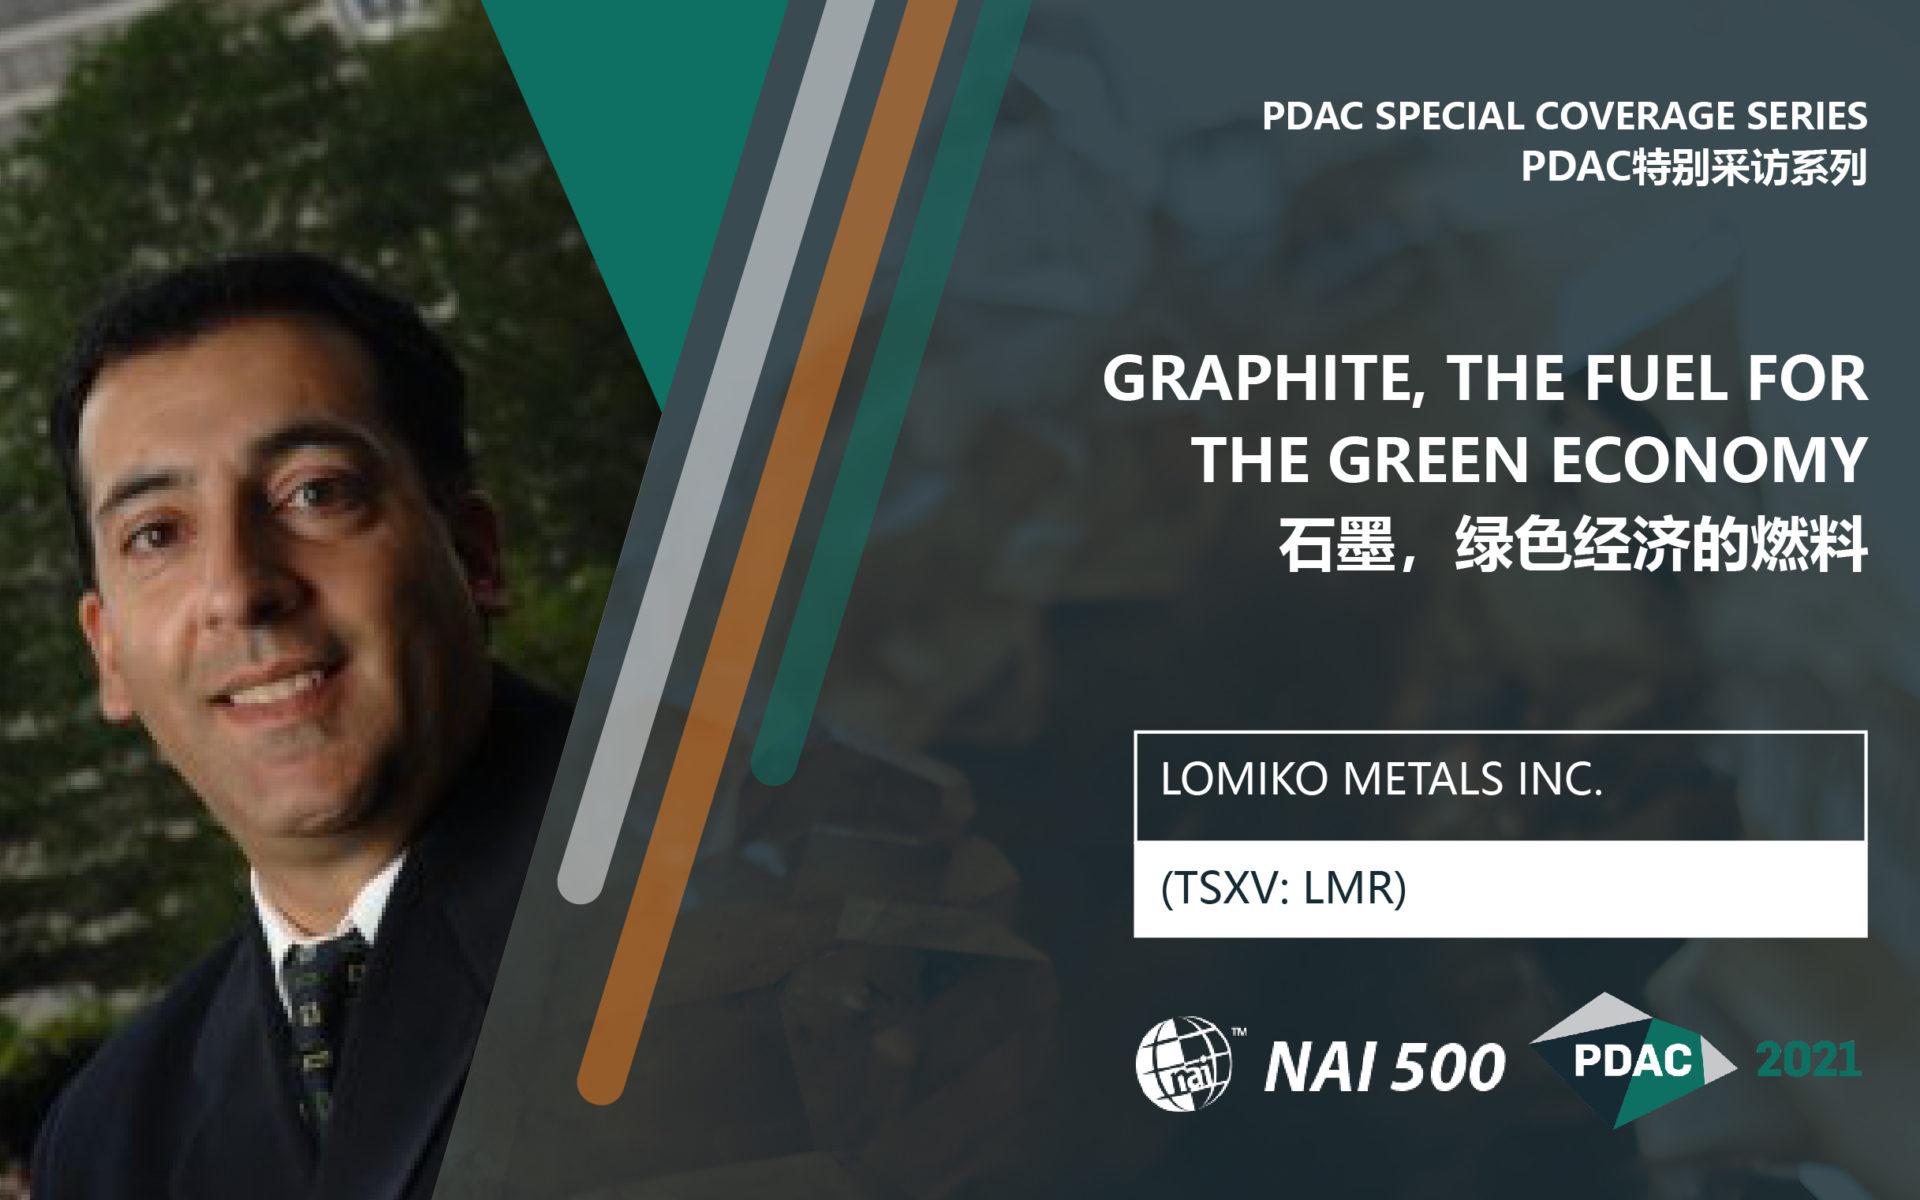 Lomiko Metals